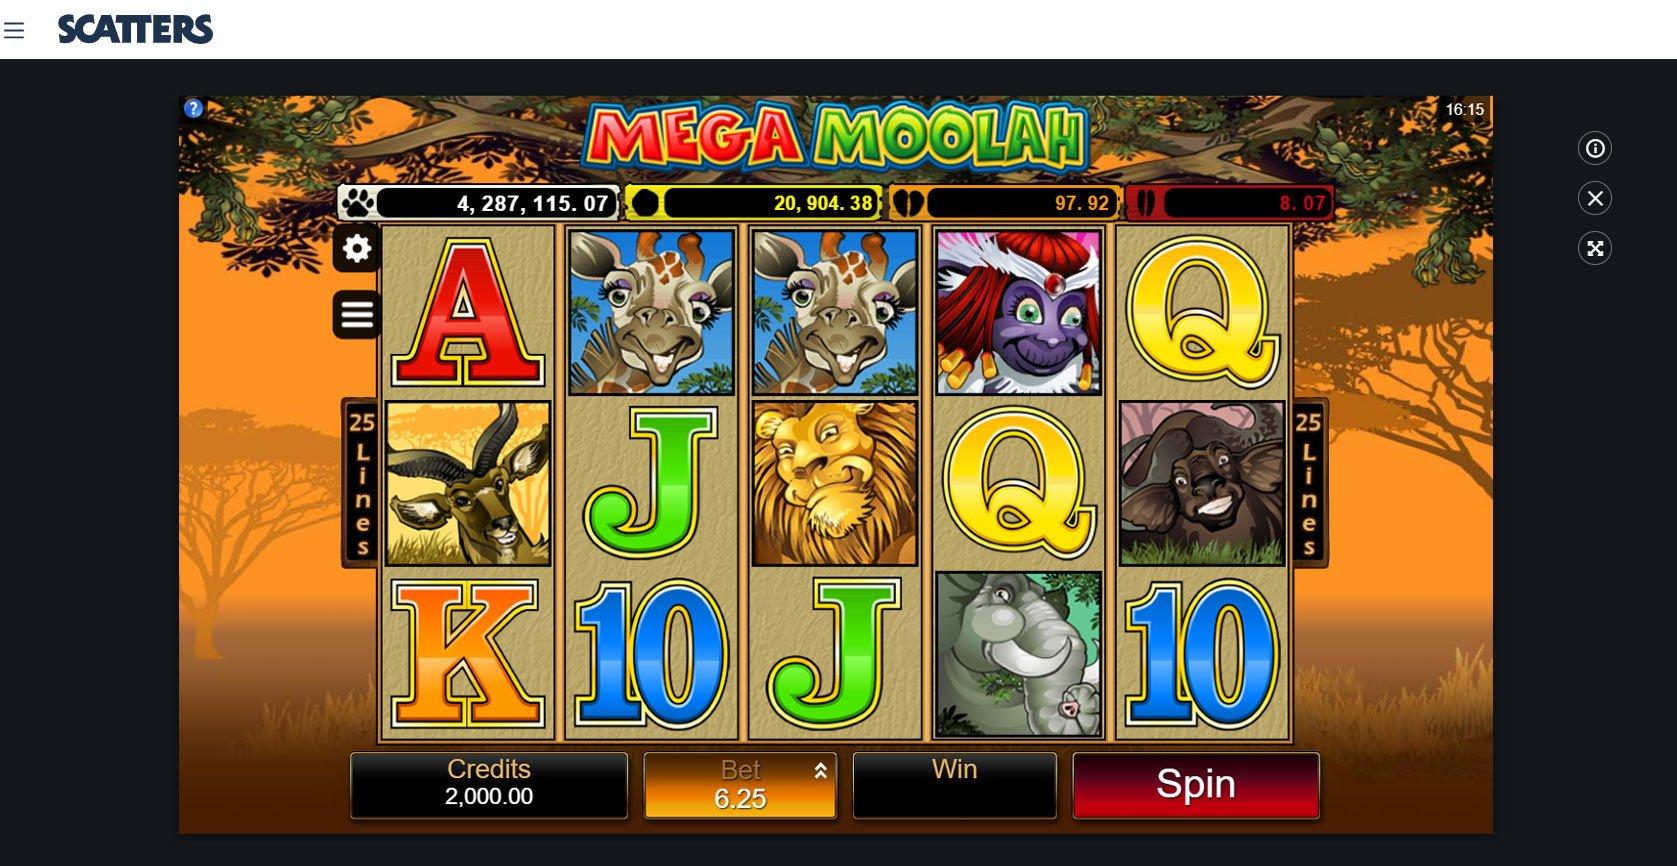 Mega Moolah Jackpot - Scatters Slots Casino